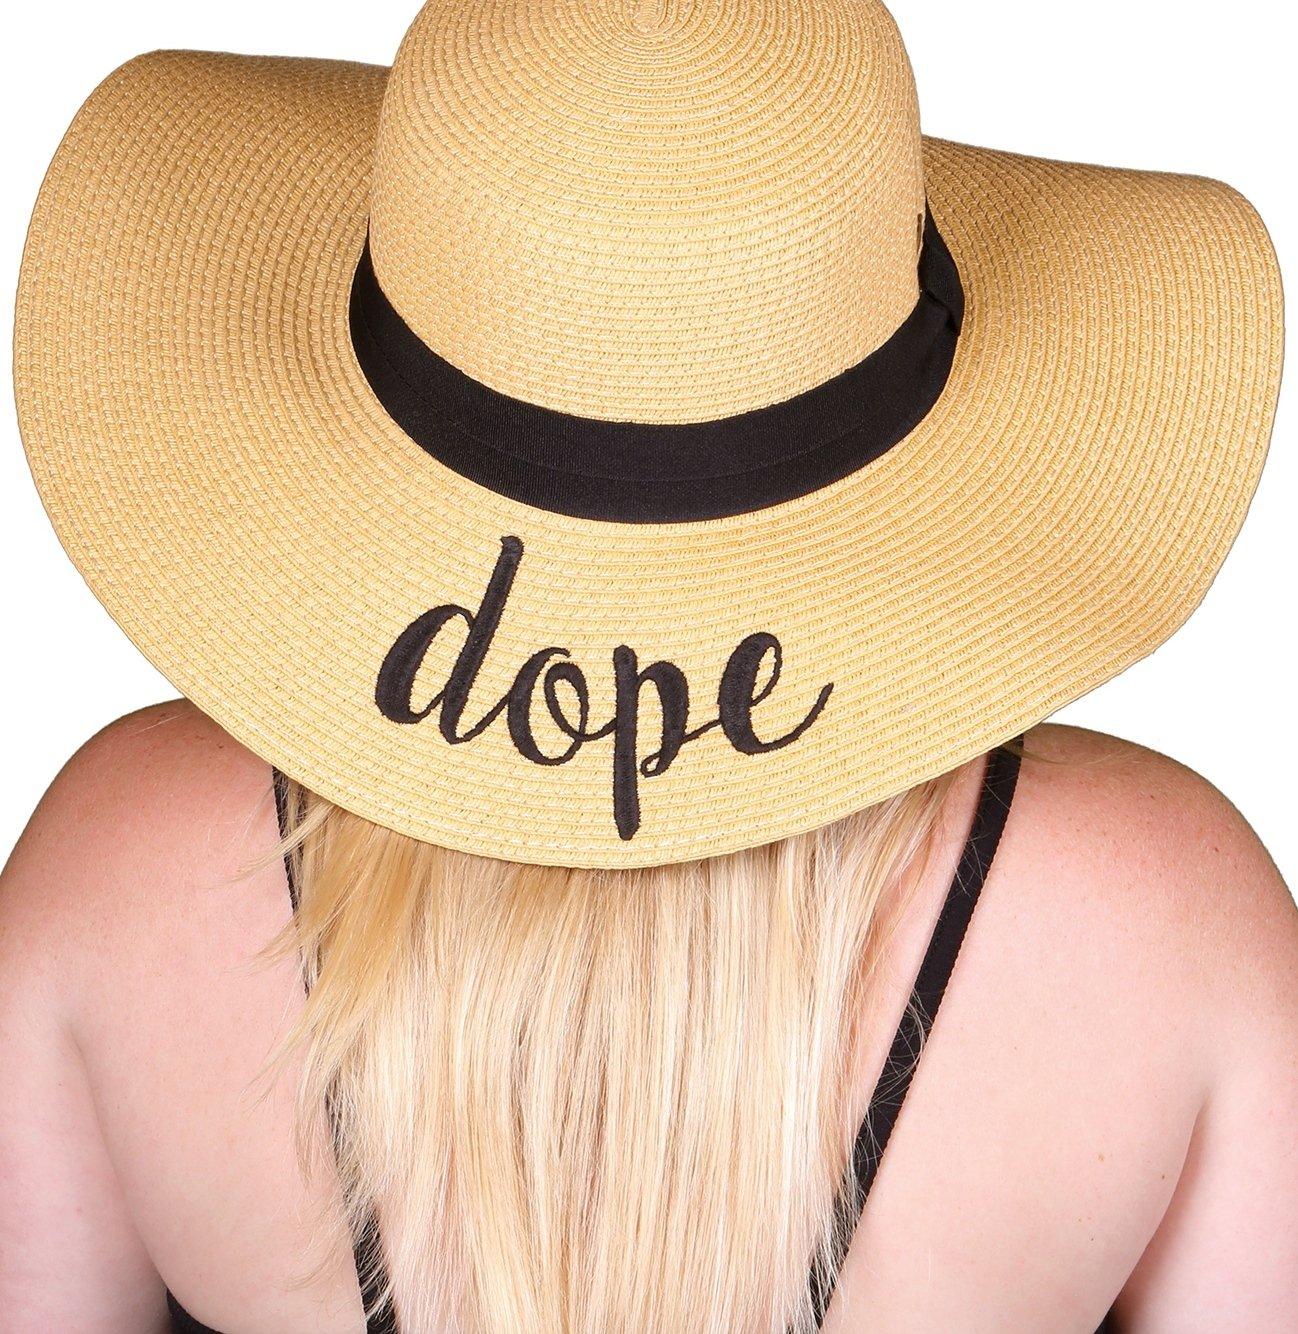 Funky Junque 's Women 's太字筆記体刺繍調節可能なビーチフロッピー太陽帽子 B074CHDQHQ Dope Dope